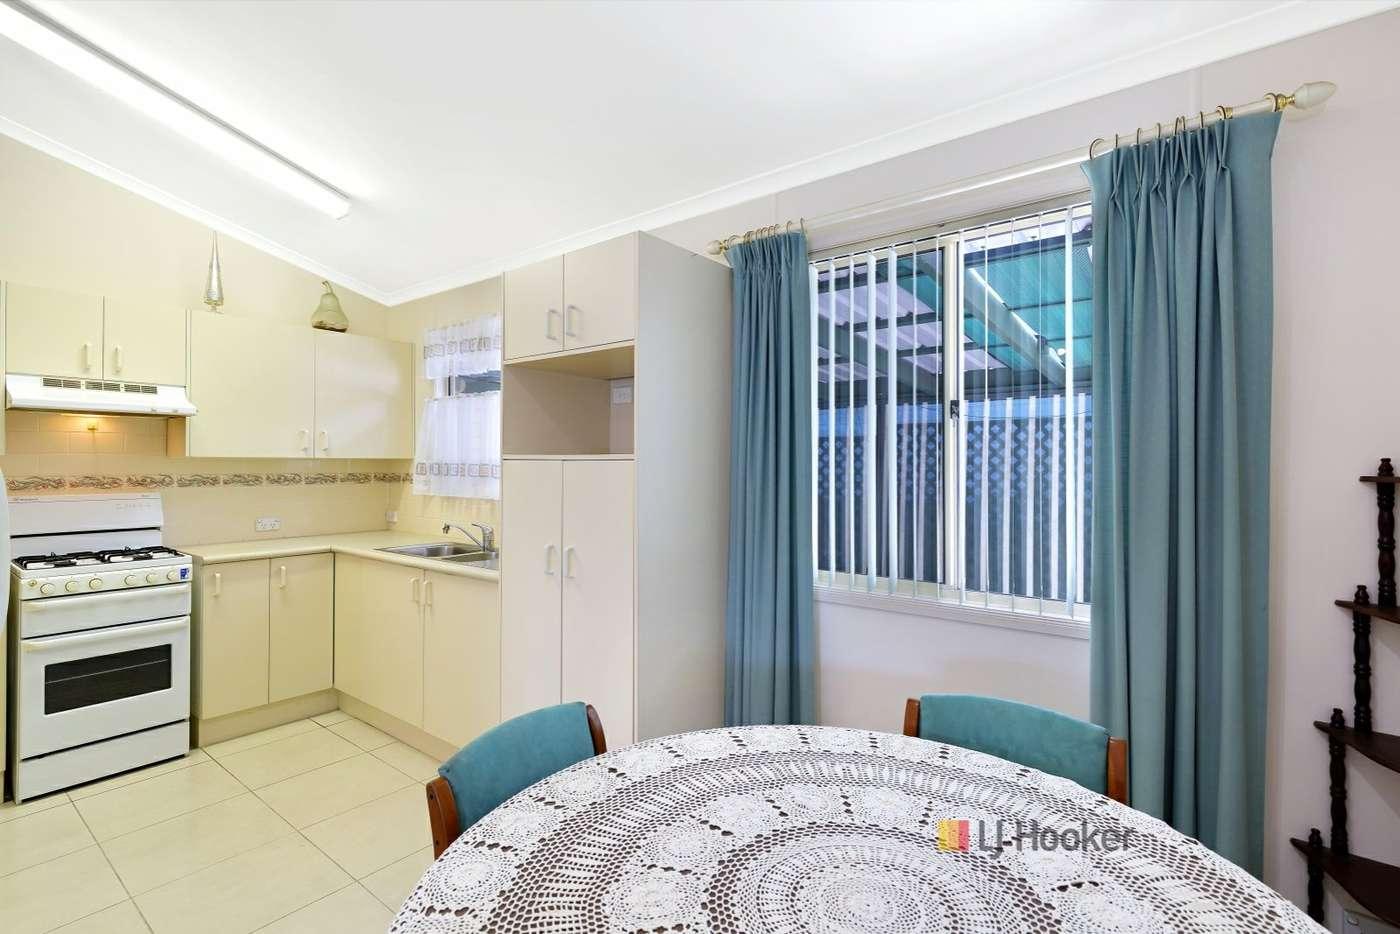 Fifth view of Homely house listing, 187/186 Sunrise Avenue, Halekulani NSW 2262